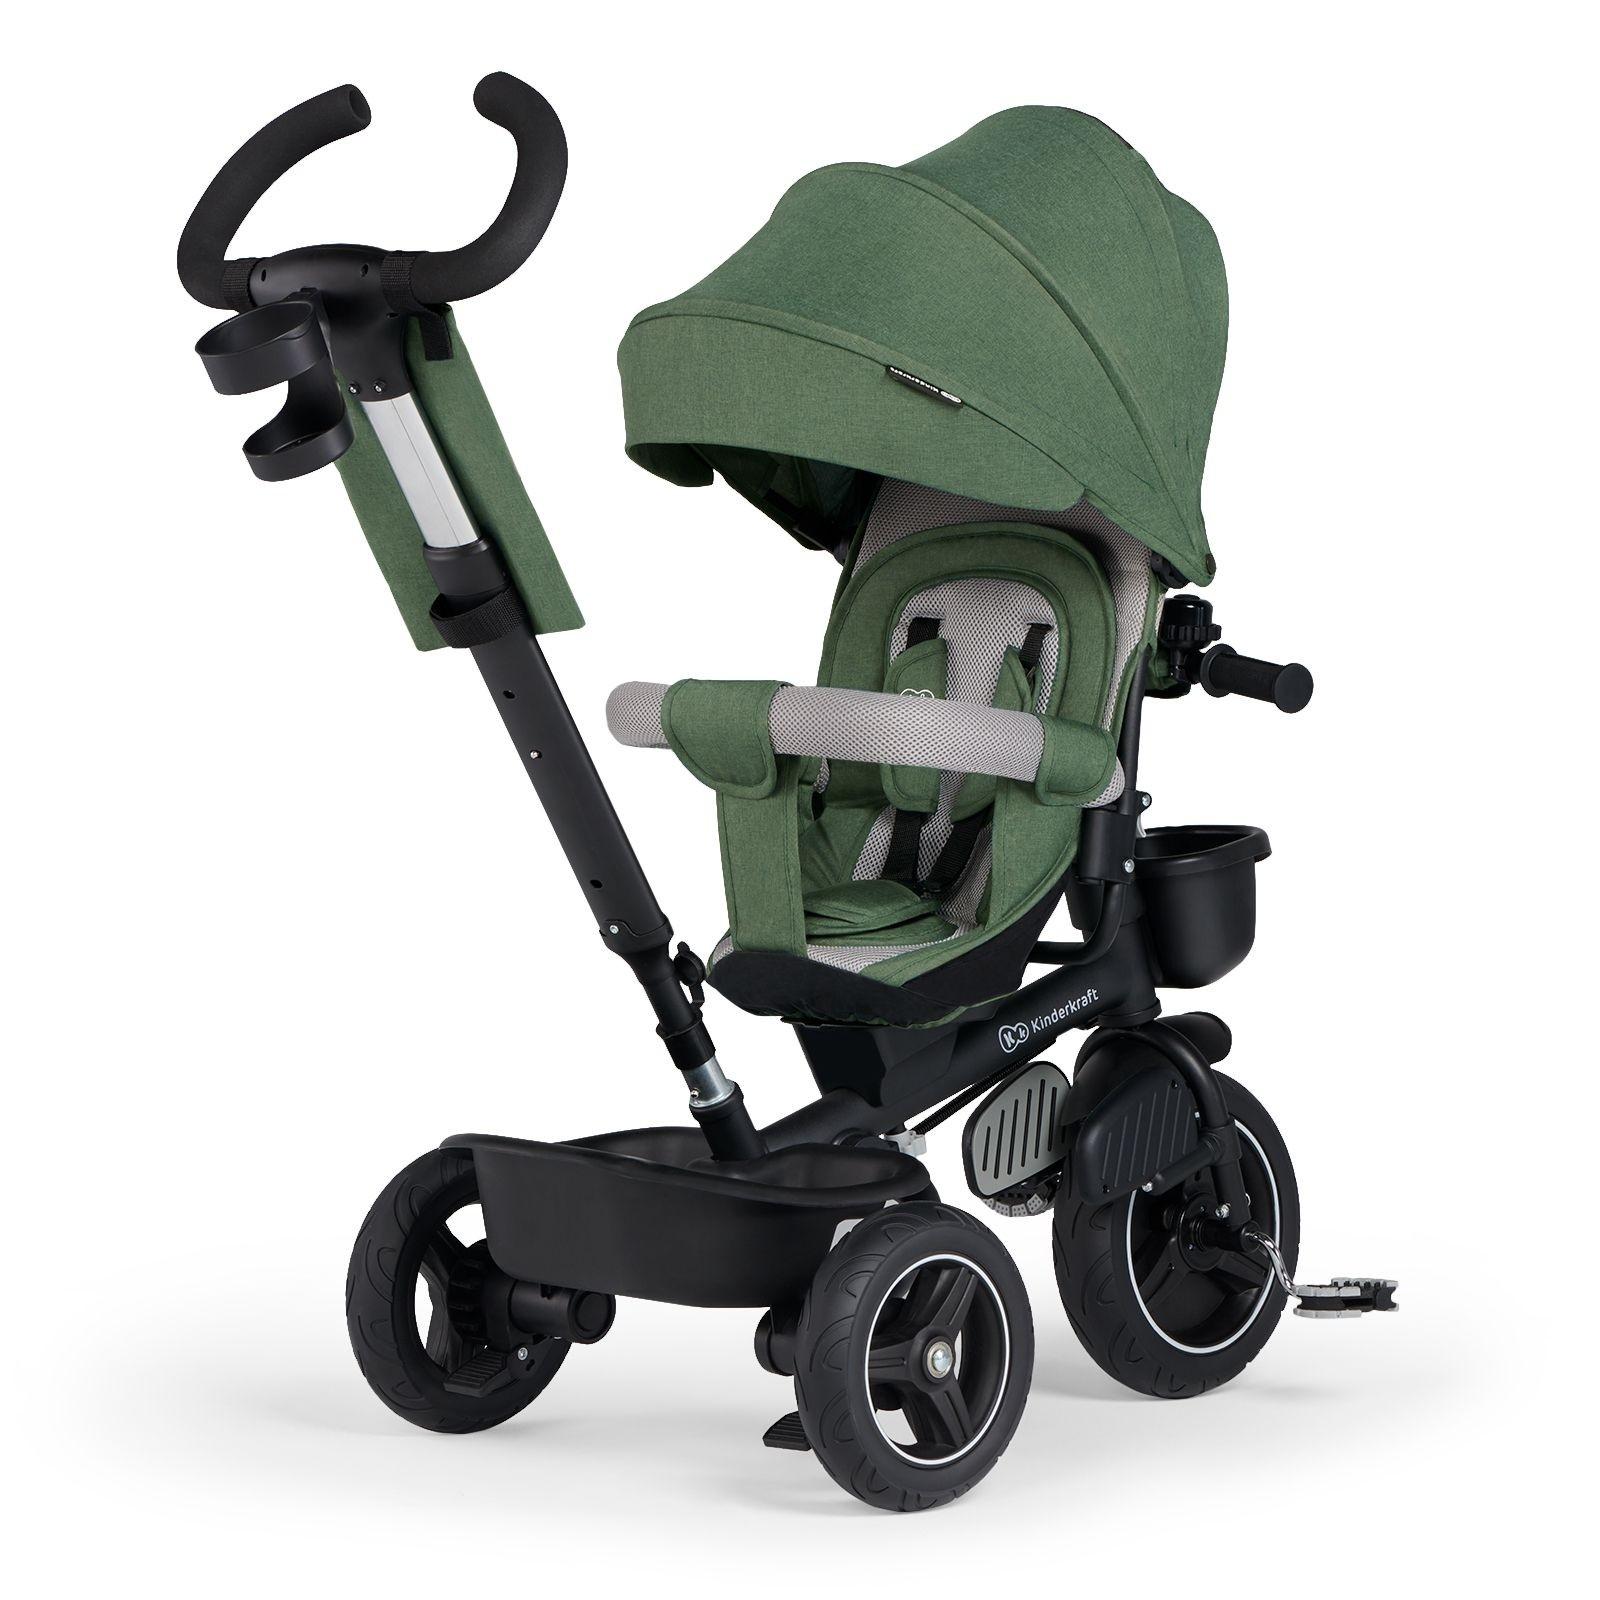 Tricikl guralica Kinderkraft SPINSTEP green